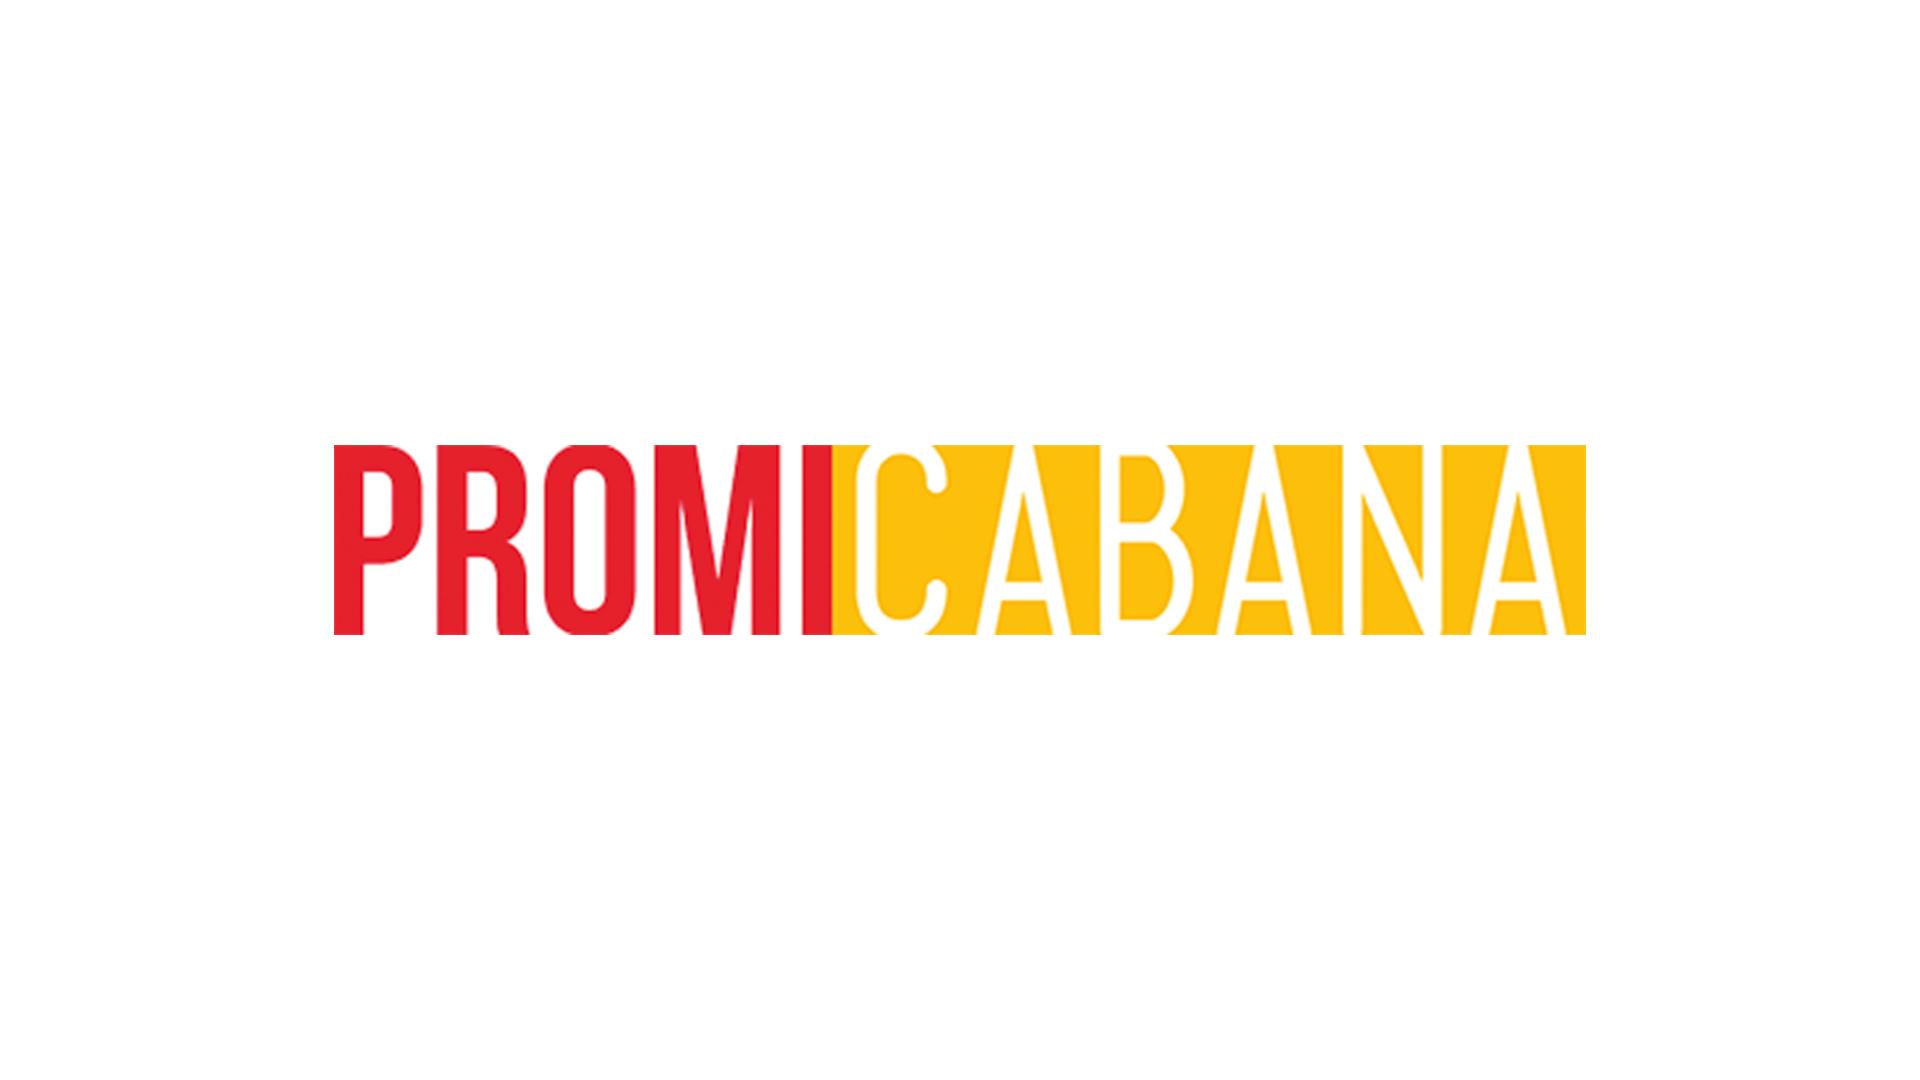 jake-gyllenhaal-Rebecca-Ferguson